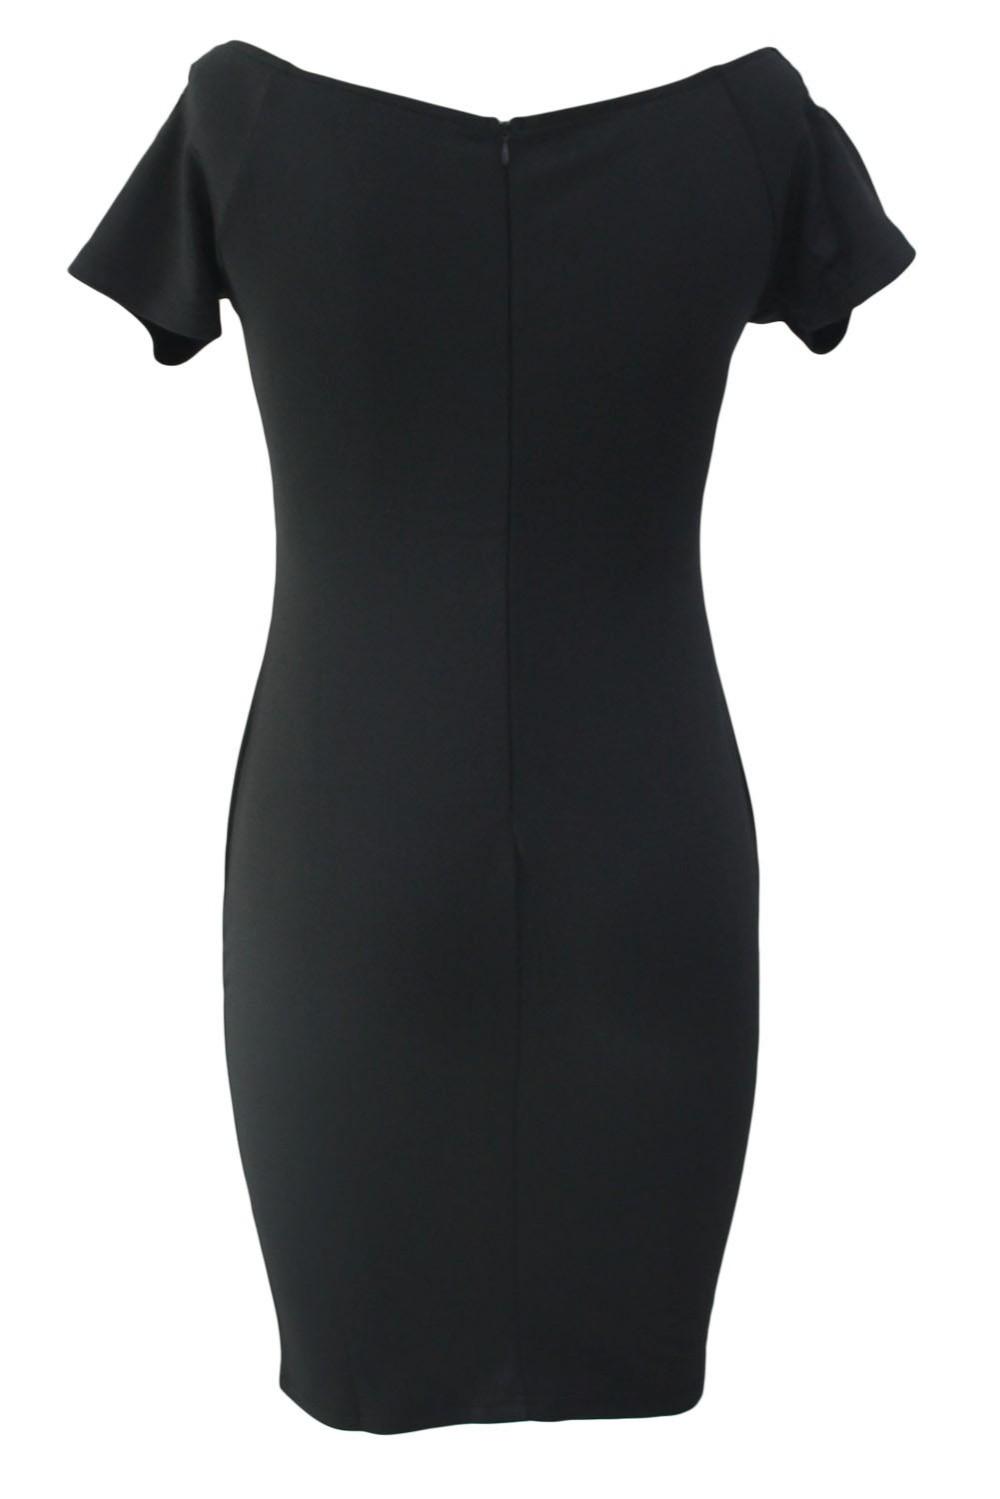 Studded-Off-Shoulder-Black-Short-Sleeve-Bodycon-Dress-LC61188-2-3